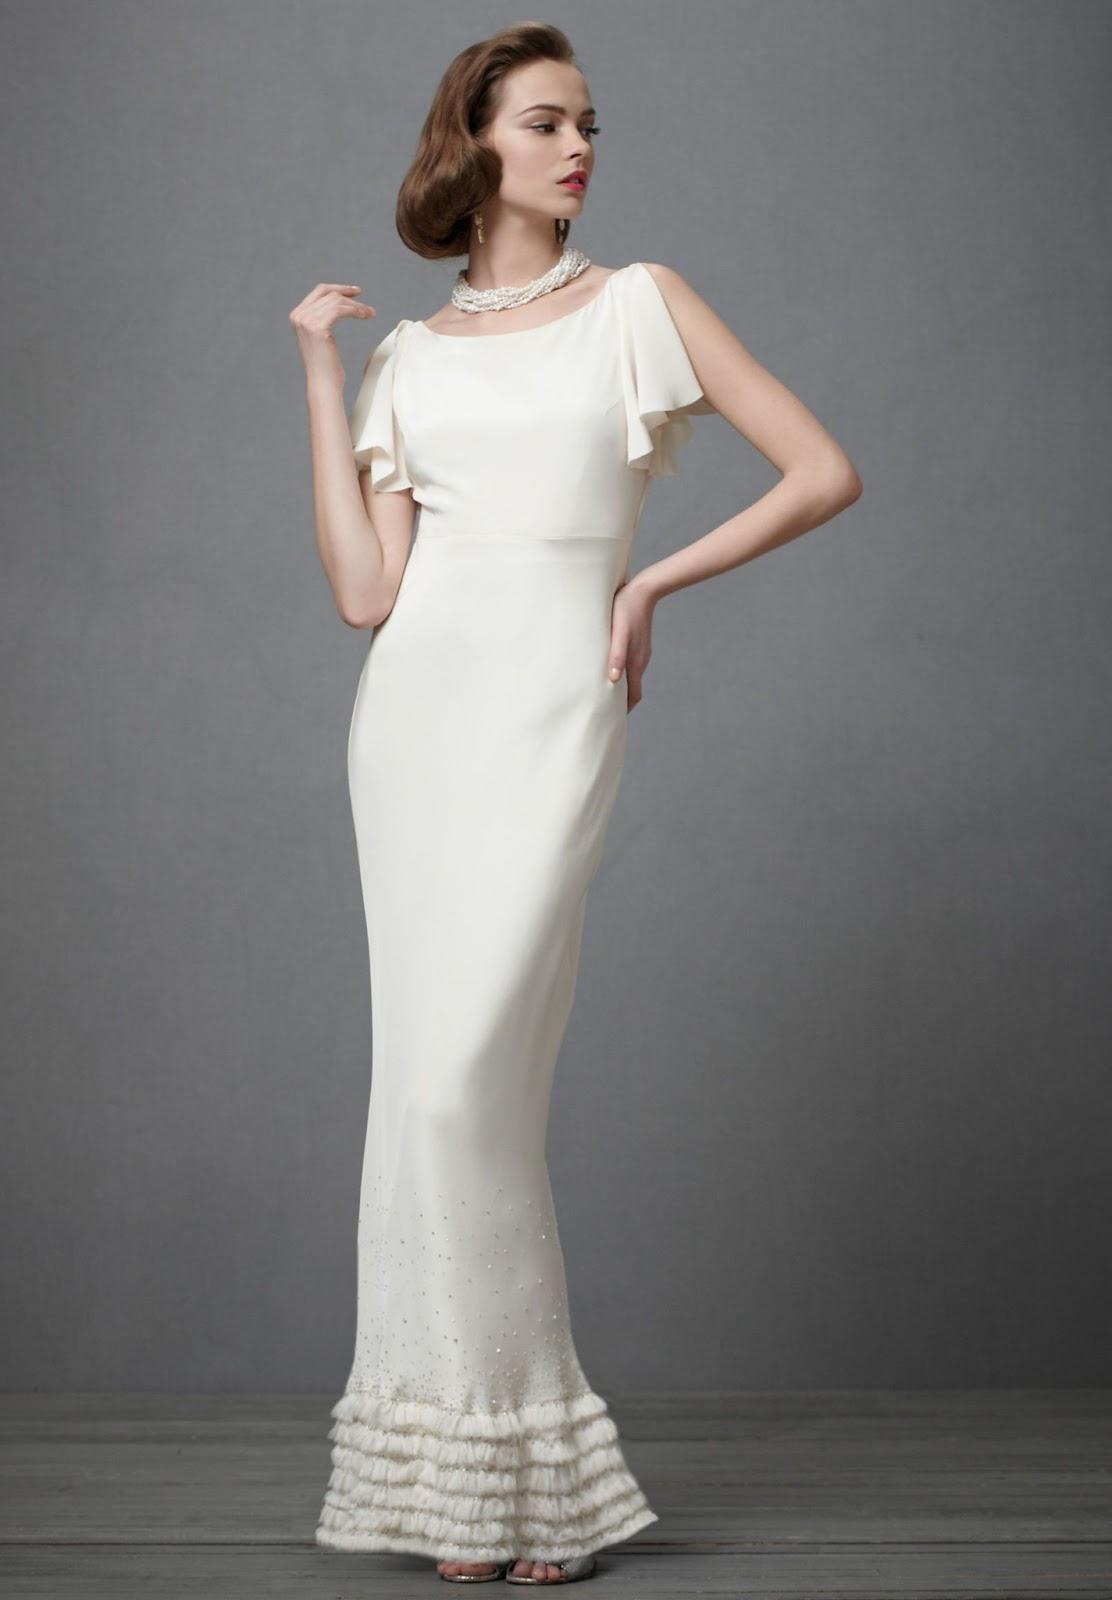 weddingreceptiondresses blogspot reception wedding dress Chiffon Bateau Column Reception Wedding Dress